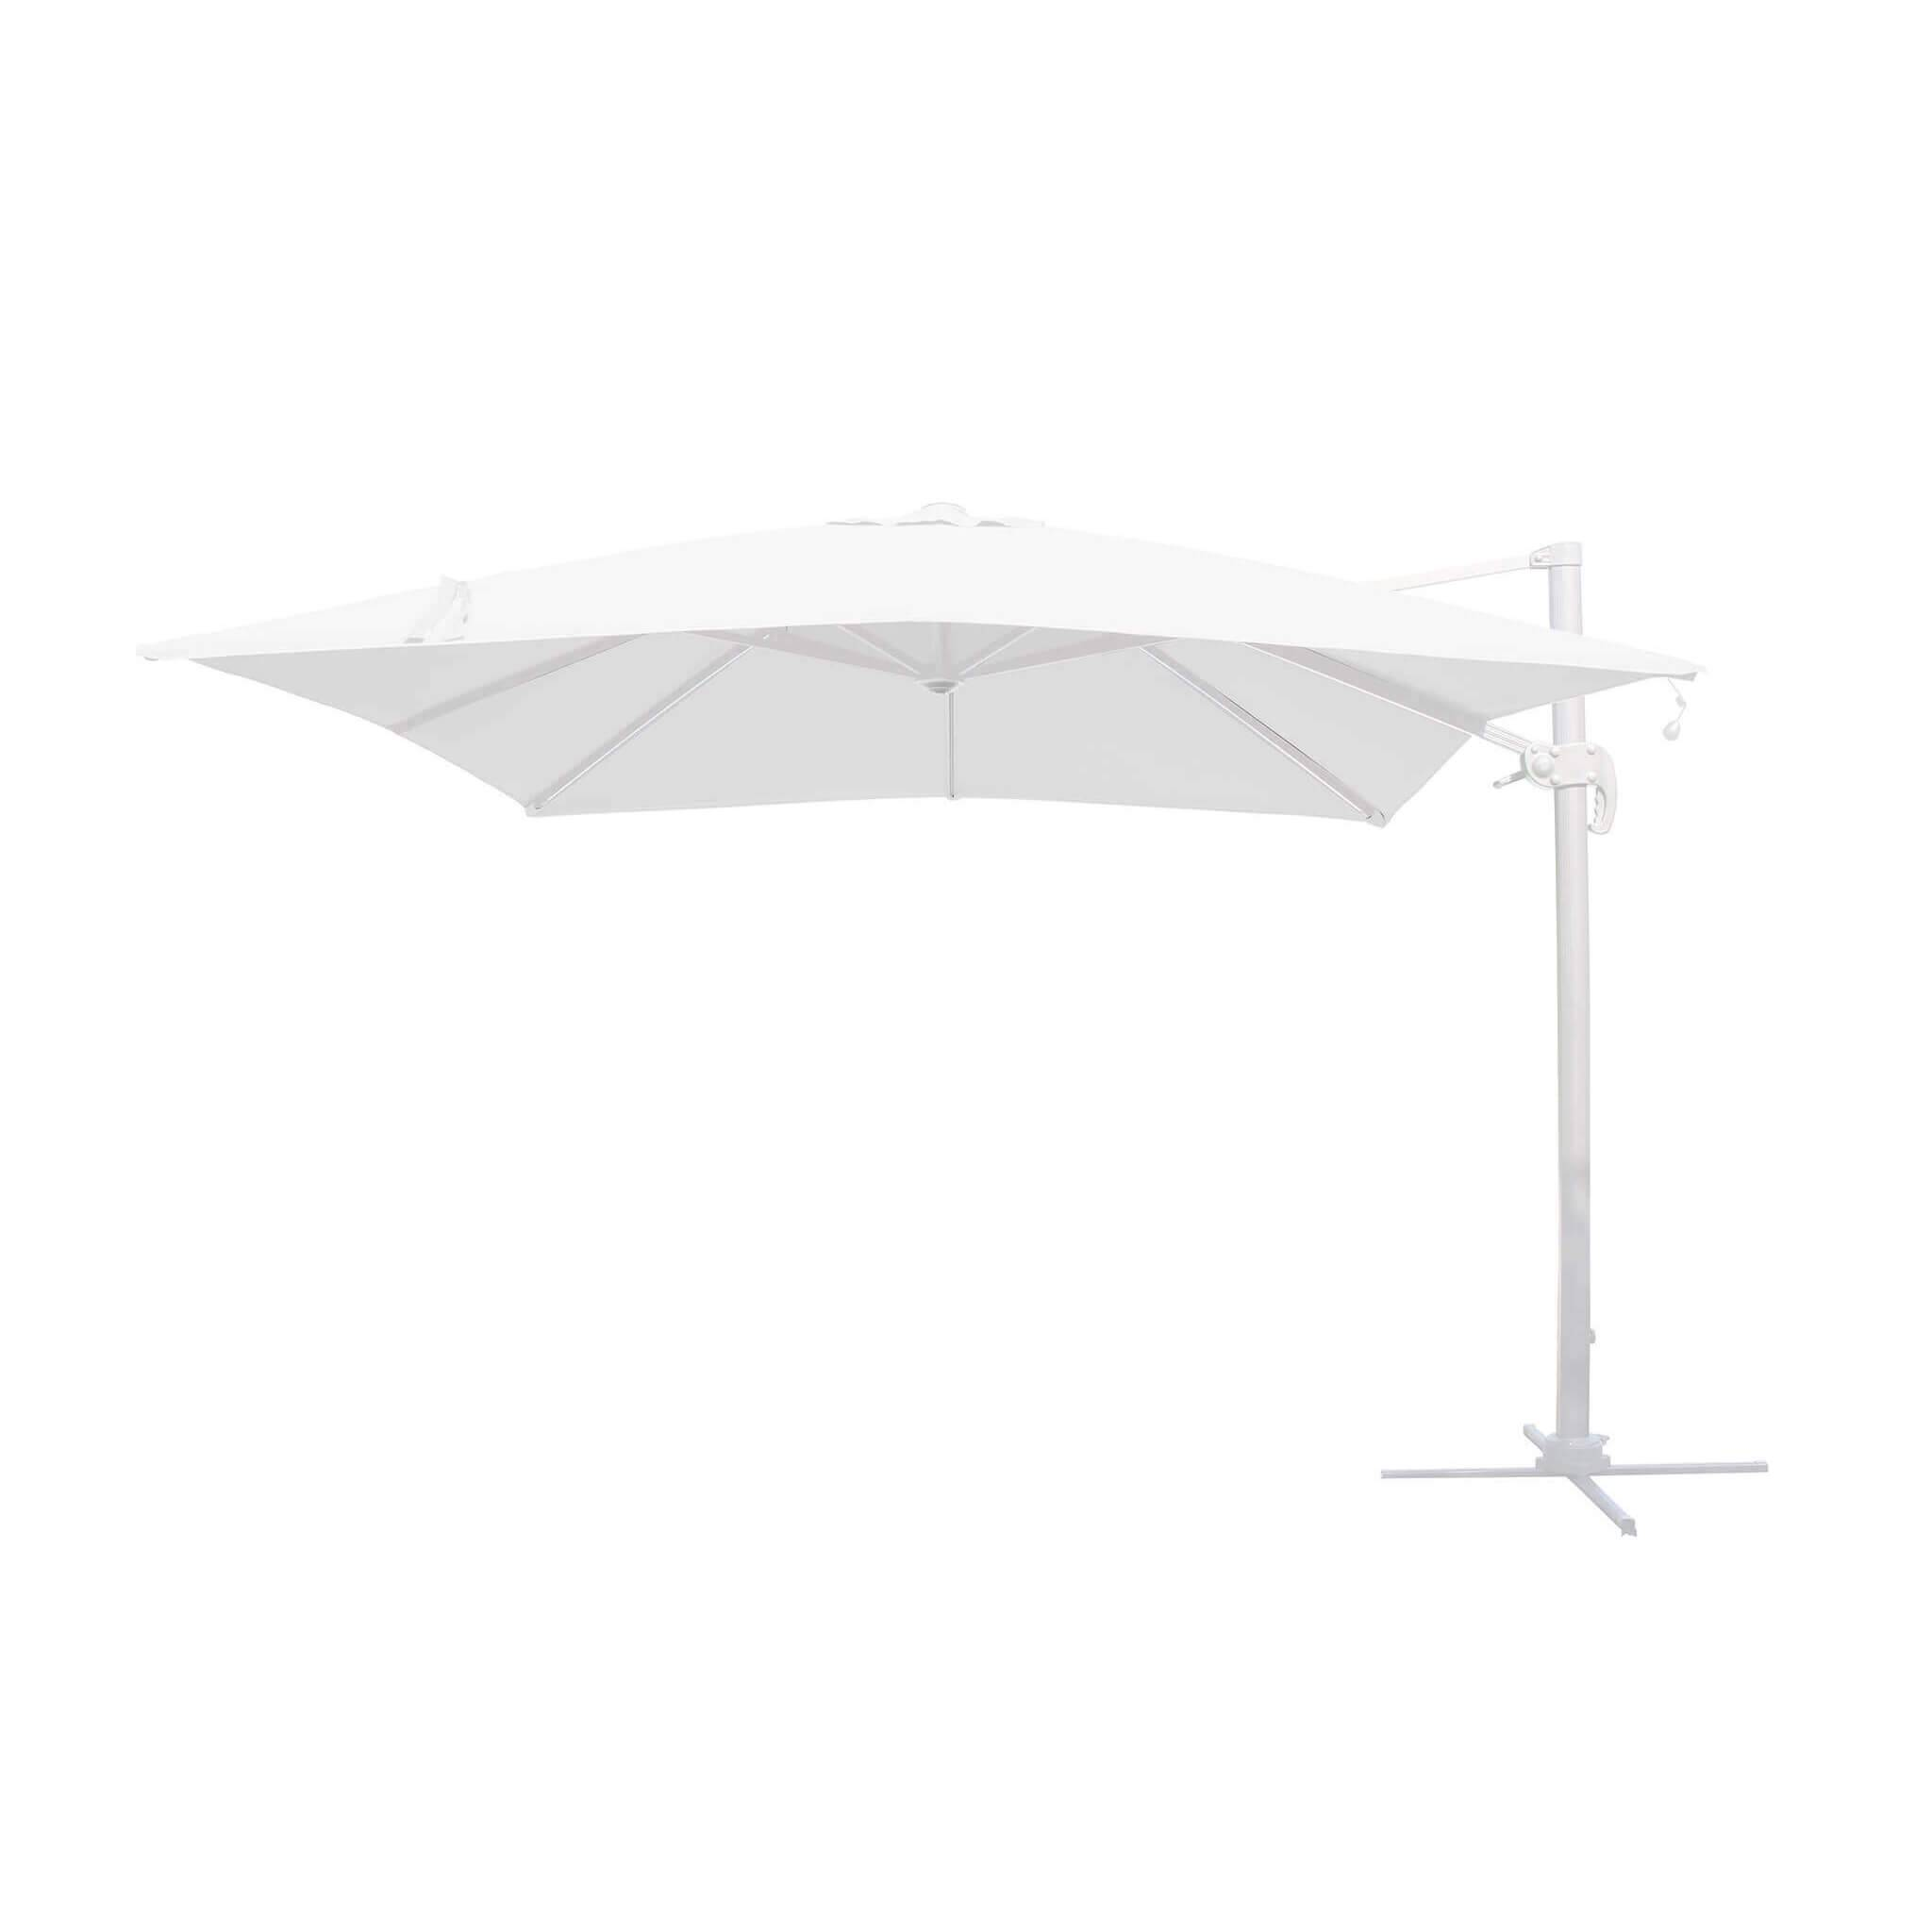 Milani Home TESLA - ombrellone da giardino decentrato con led 3 X 4